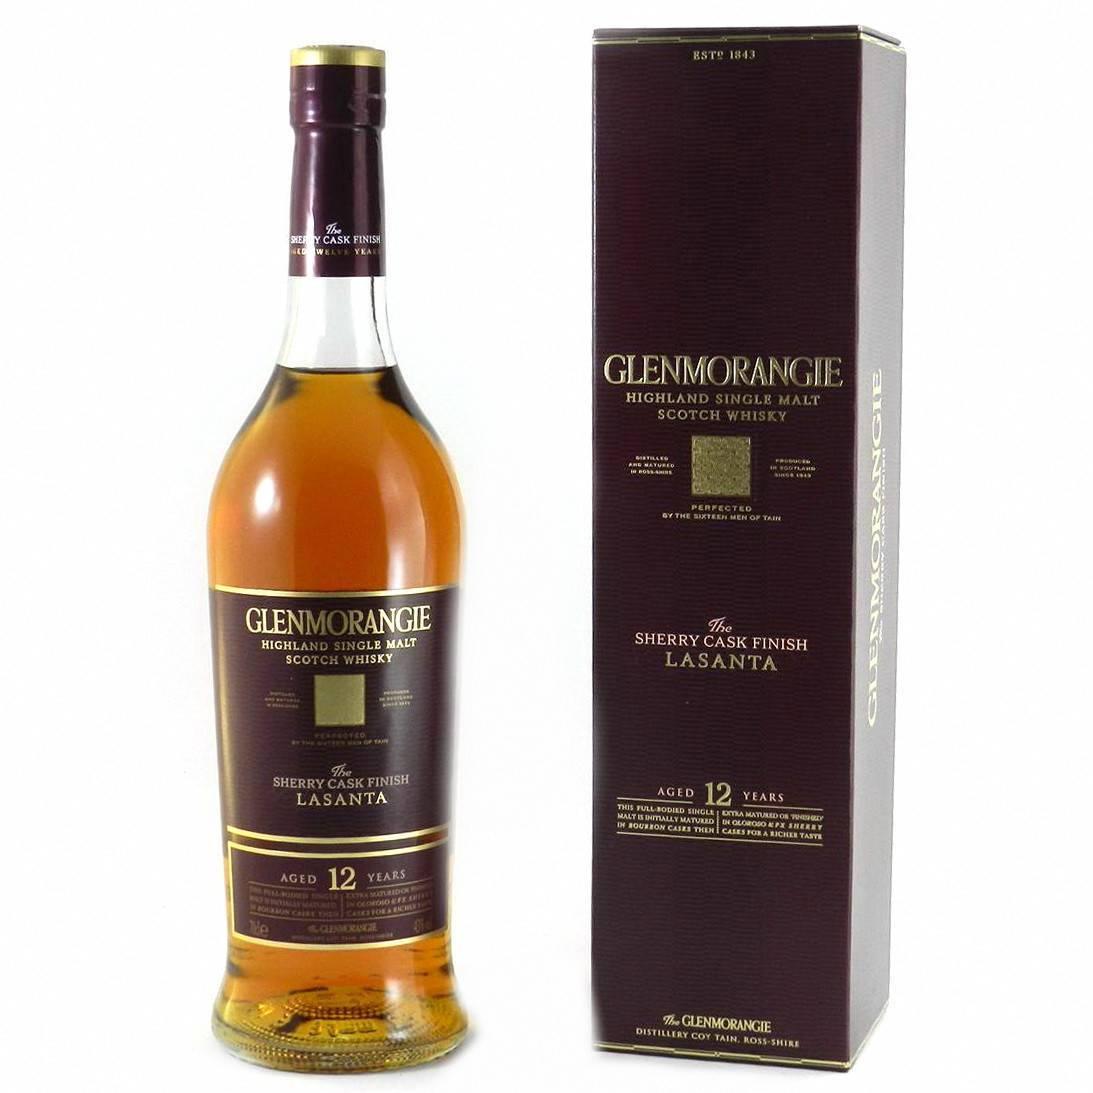 Виски glenmorangie (гленморанджи) — история, описание и виды шотландского виски